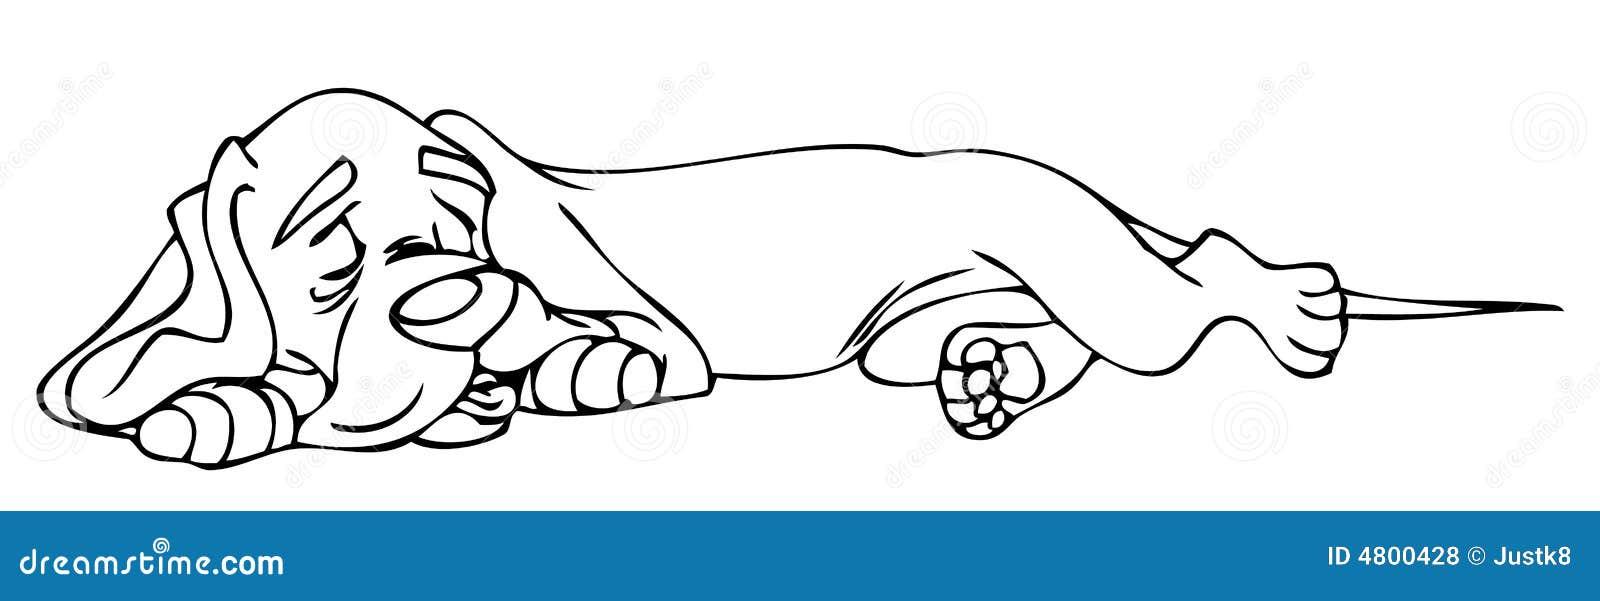 coloring book - sleeping dog royalty free stock photos